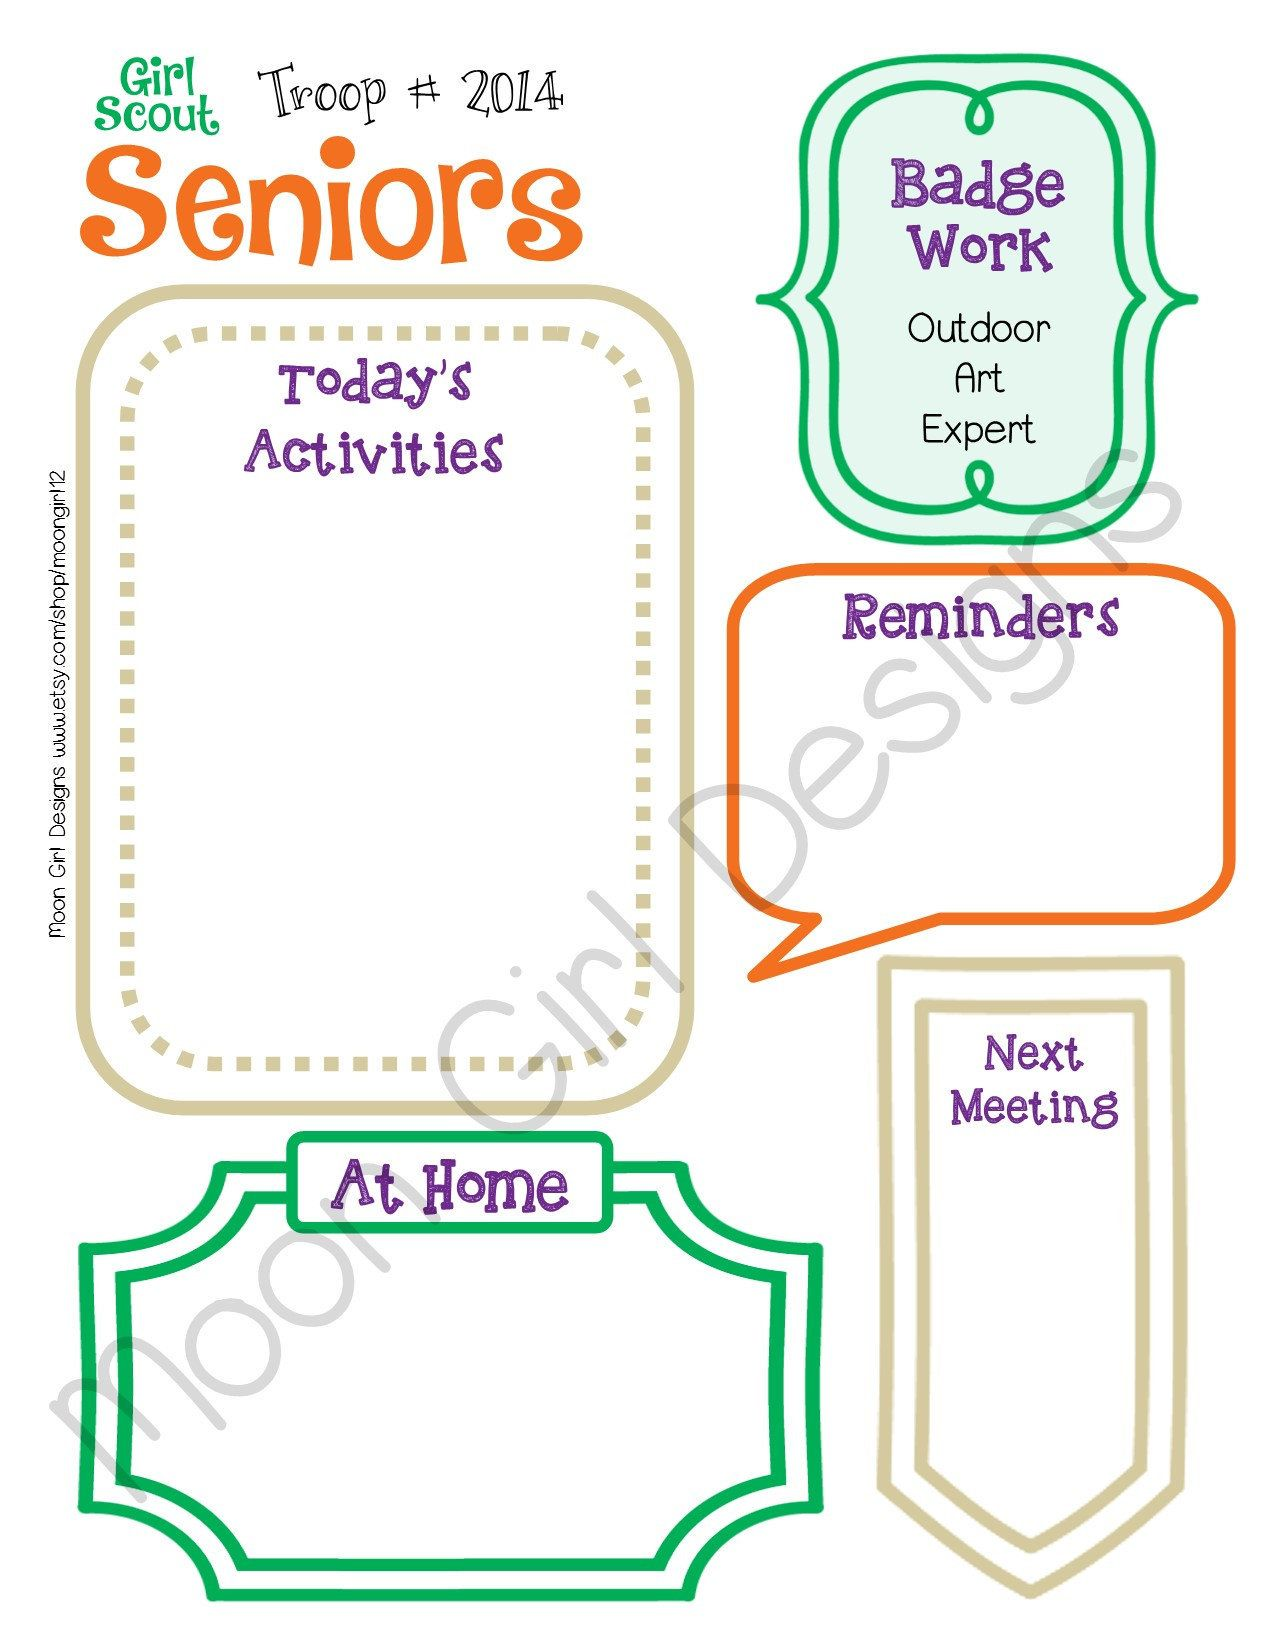 Senior Meeting Activity Planner Girl Scouts Editable